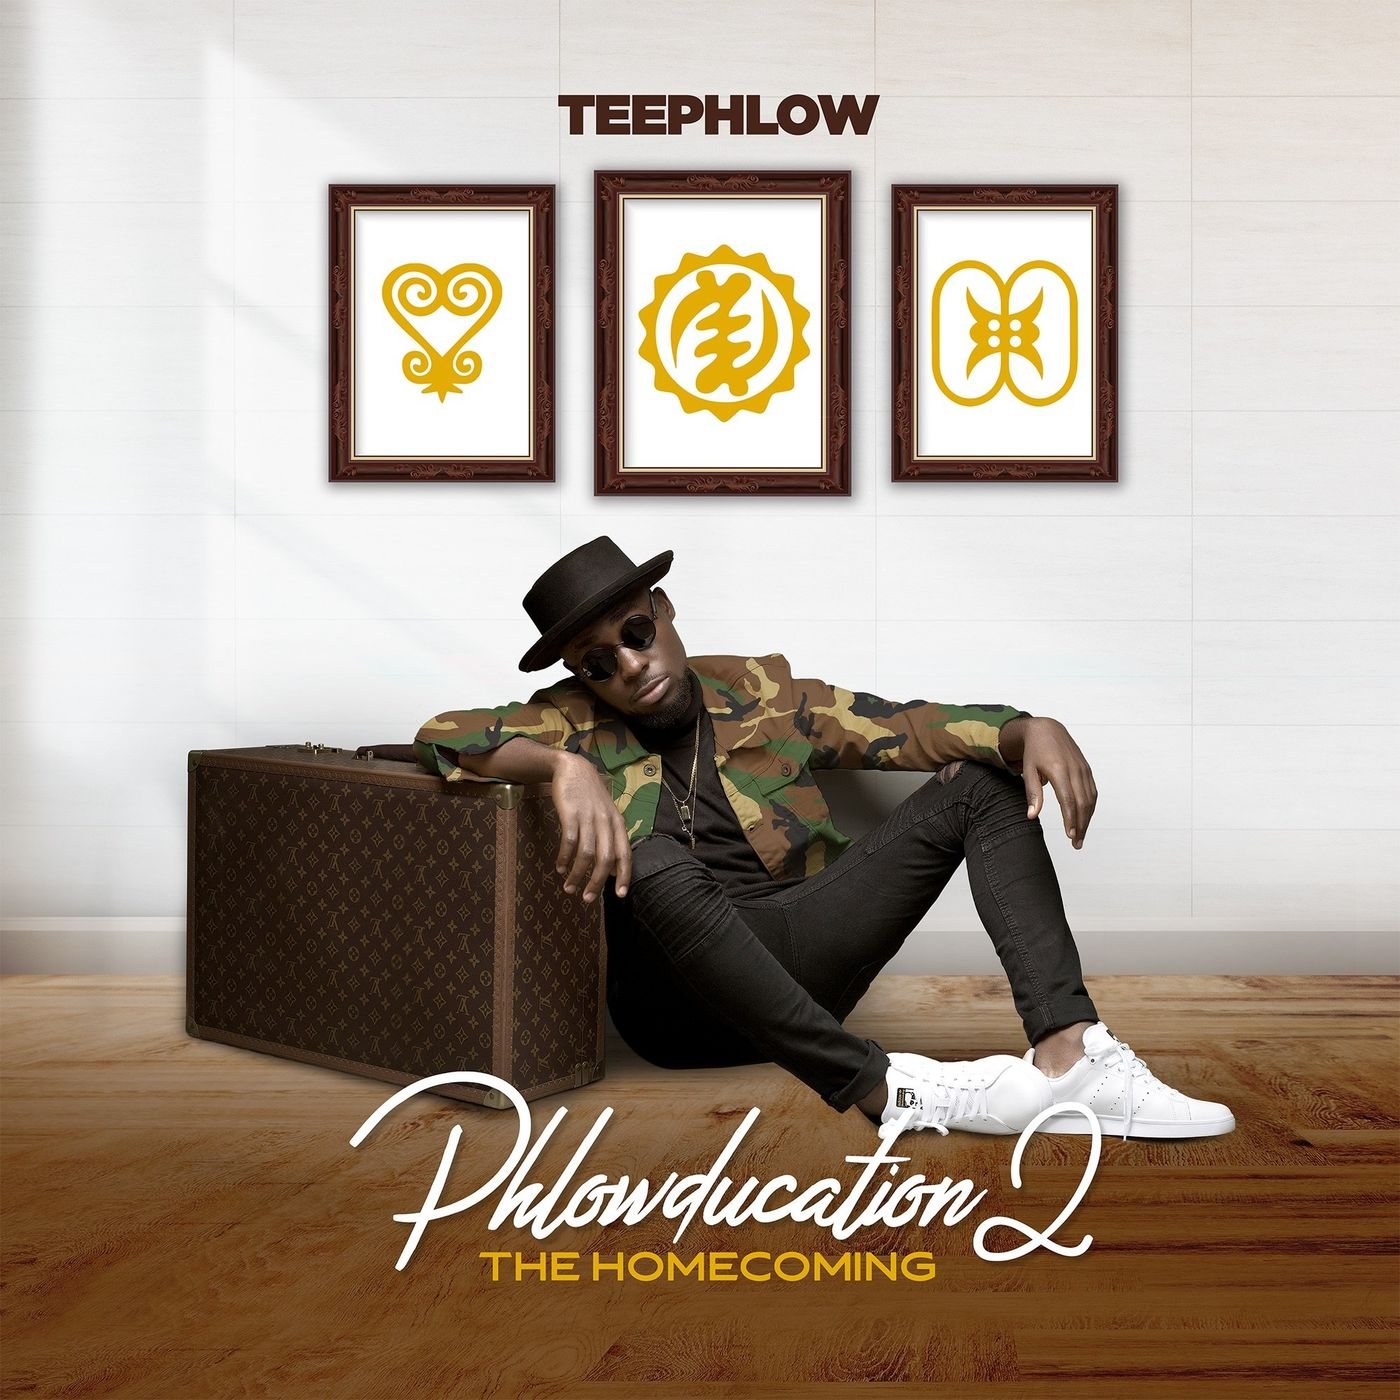 teephlow-drops-latest-album,-'phlowducation-2'